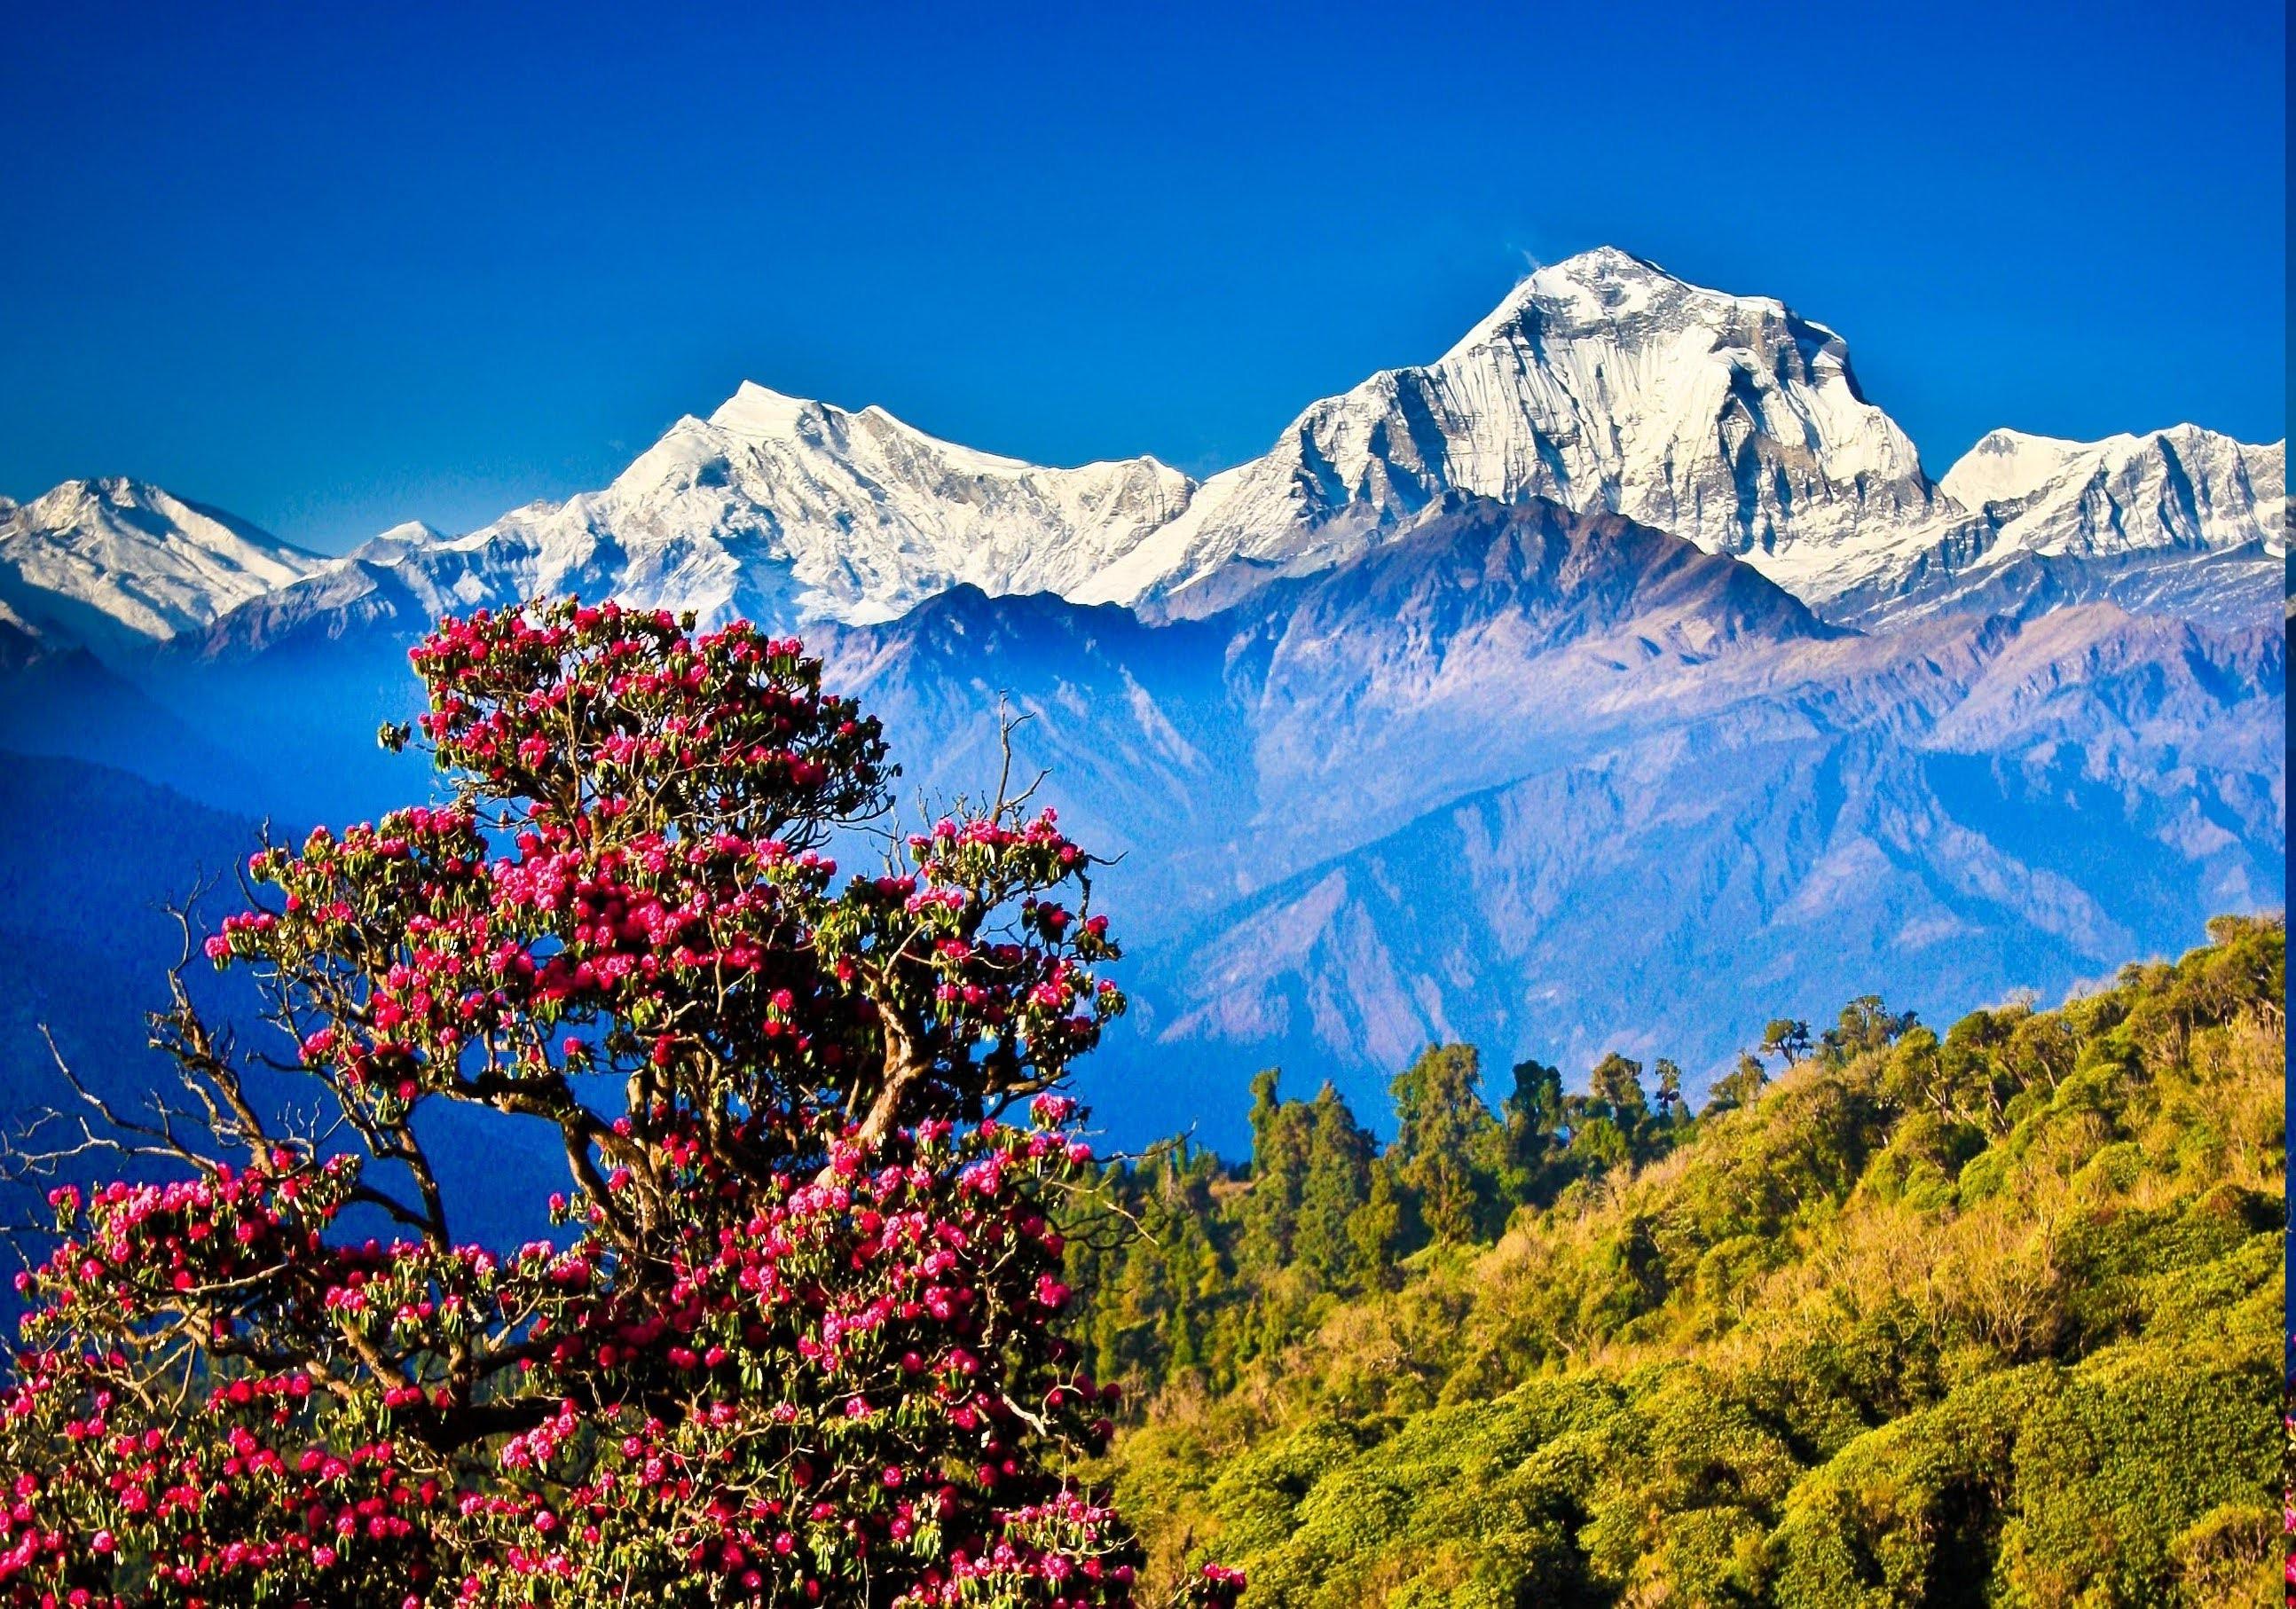 Himalayas wallpaper 69 images - Himalaya pictures wallpaper ...